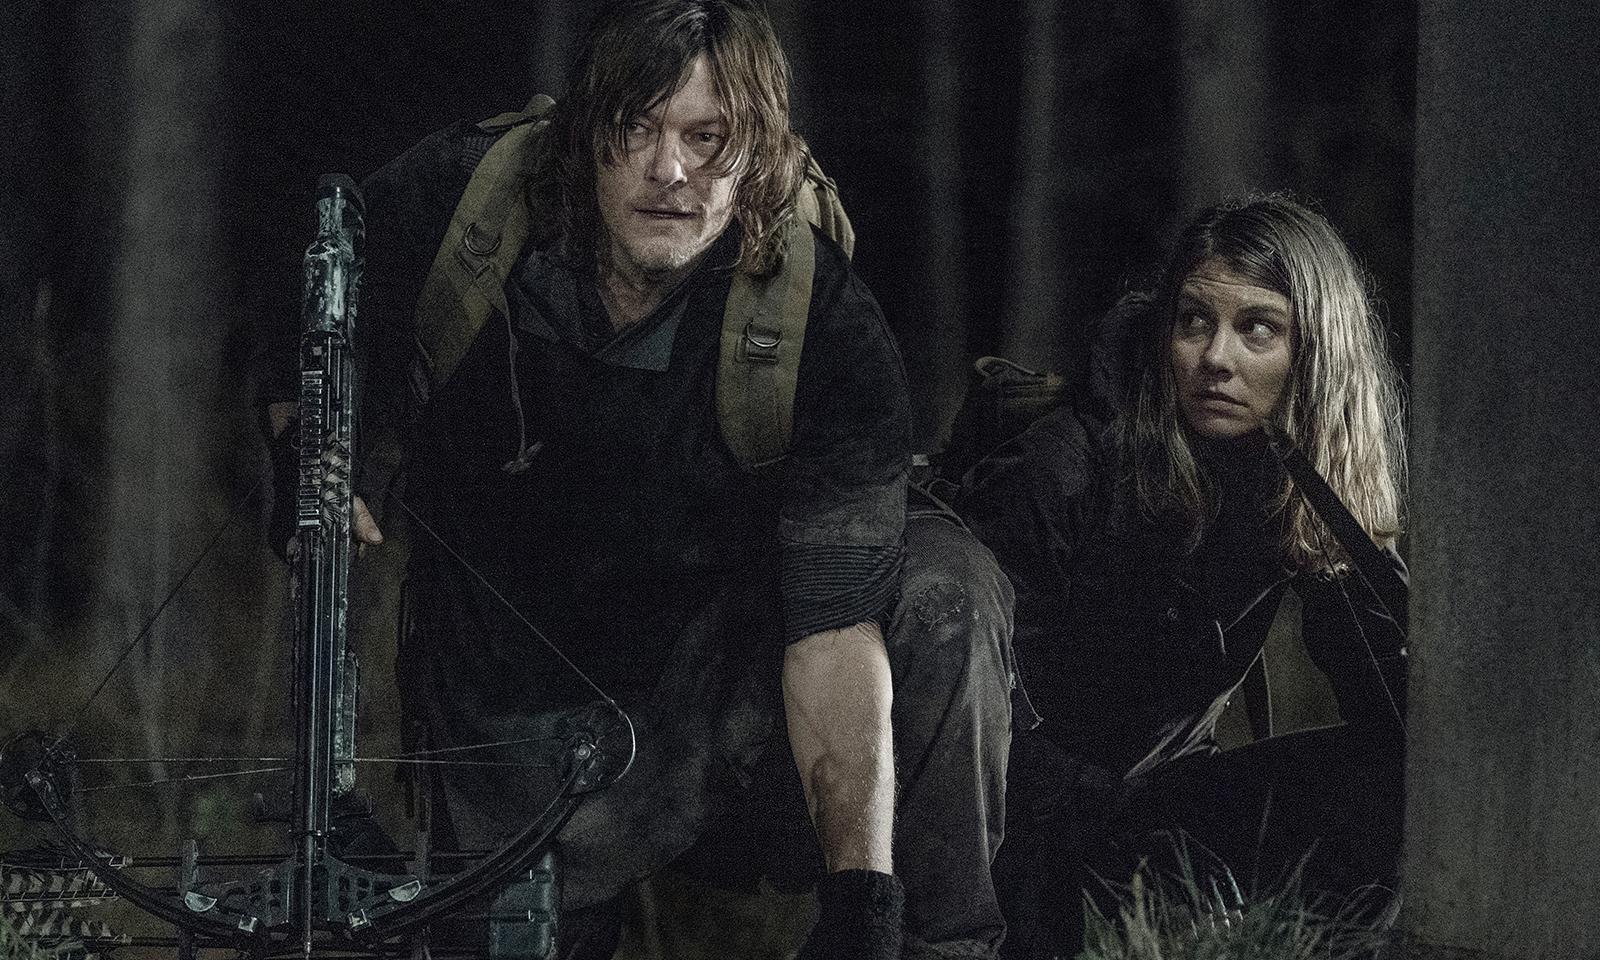 Daryl e Maggie escondidos na floresta no episódio 2 da 11ª temporada de The Walking Dead.